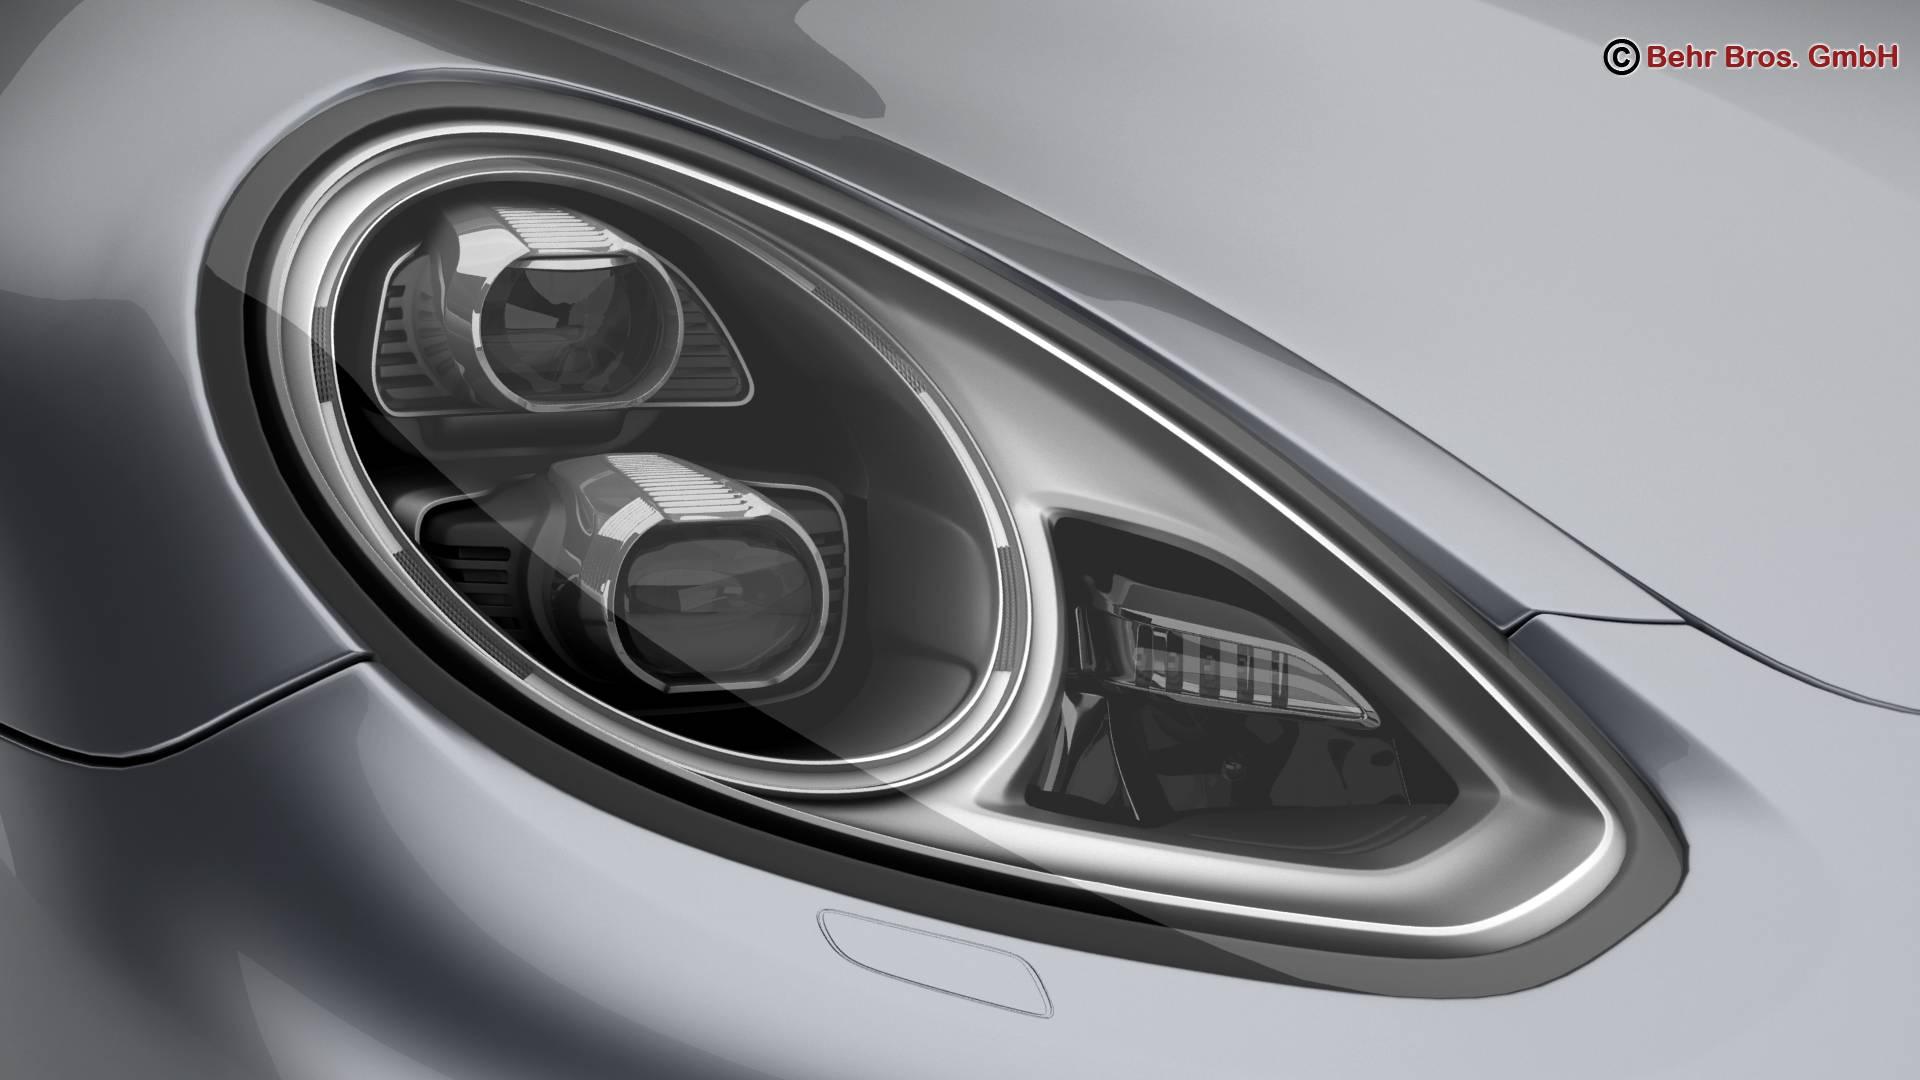 porsche panamera turbo s 2014 3d model 3ds max fbx c4d lwo ma mb obj 215069